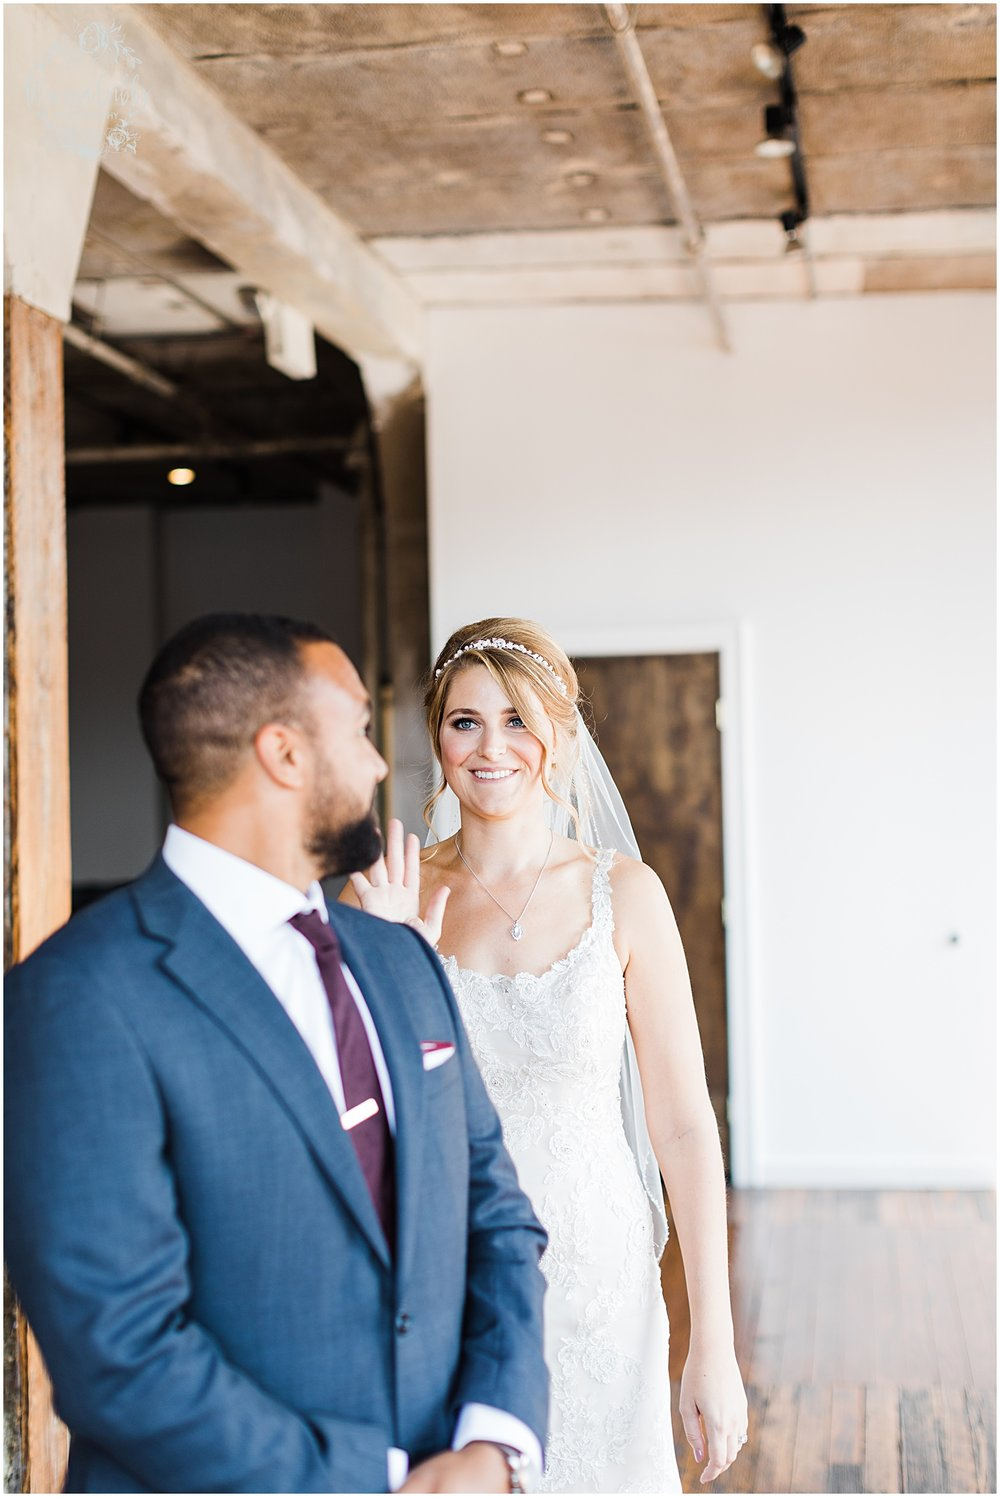 BAUER WEDDING   KELSEA & JUSTIN   MARISSA CRIBBS PHOTOGRAPHY_6503.jpg